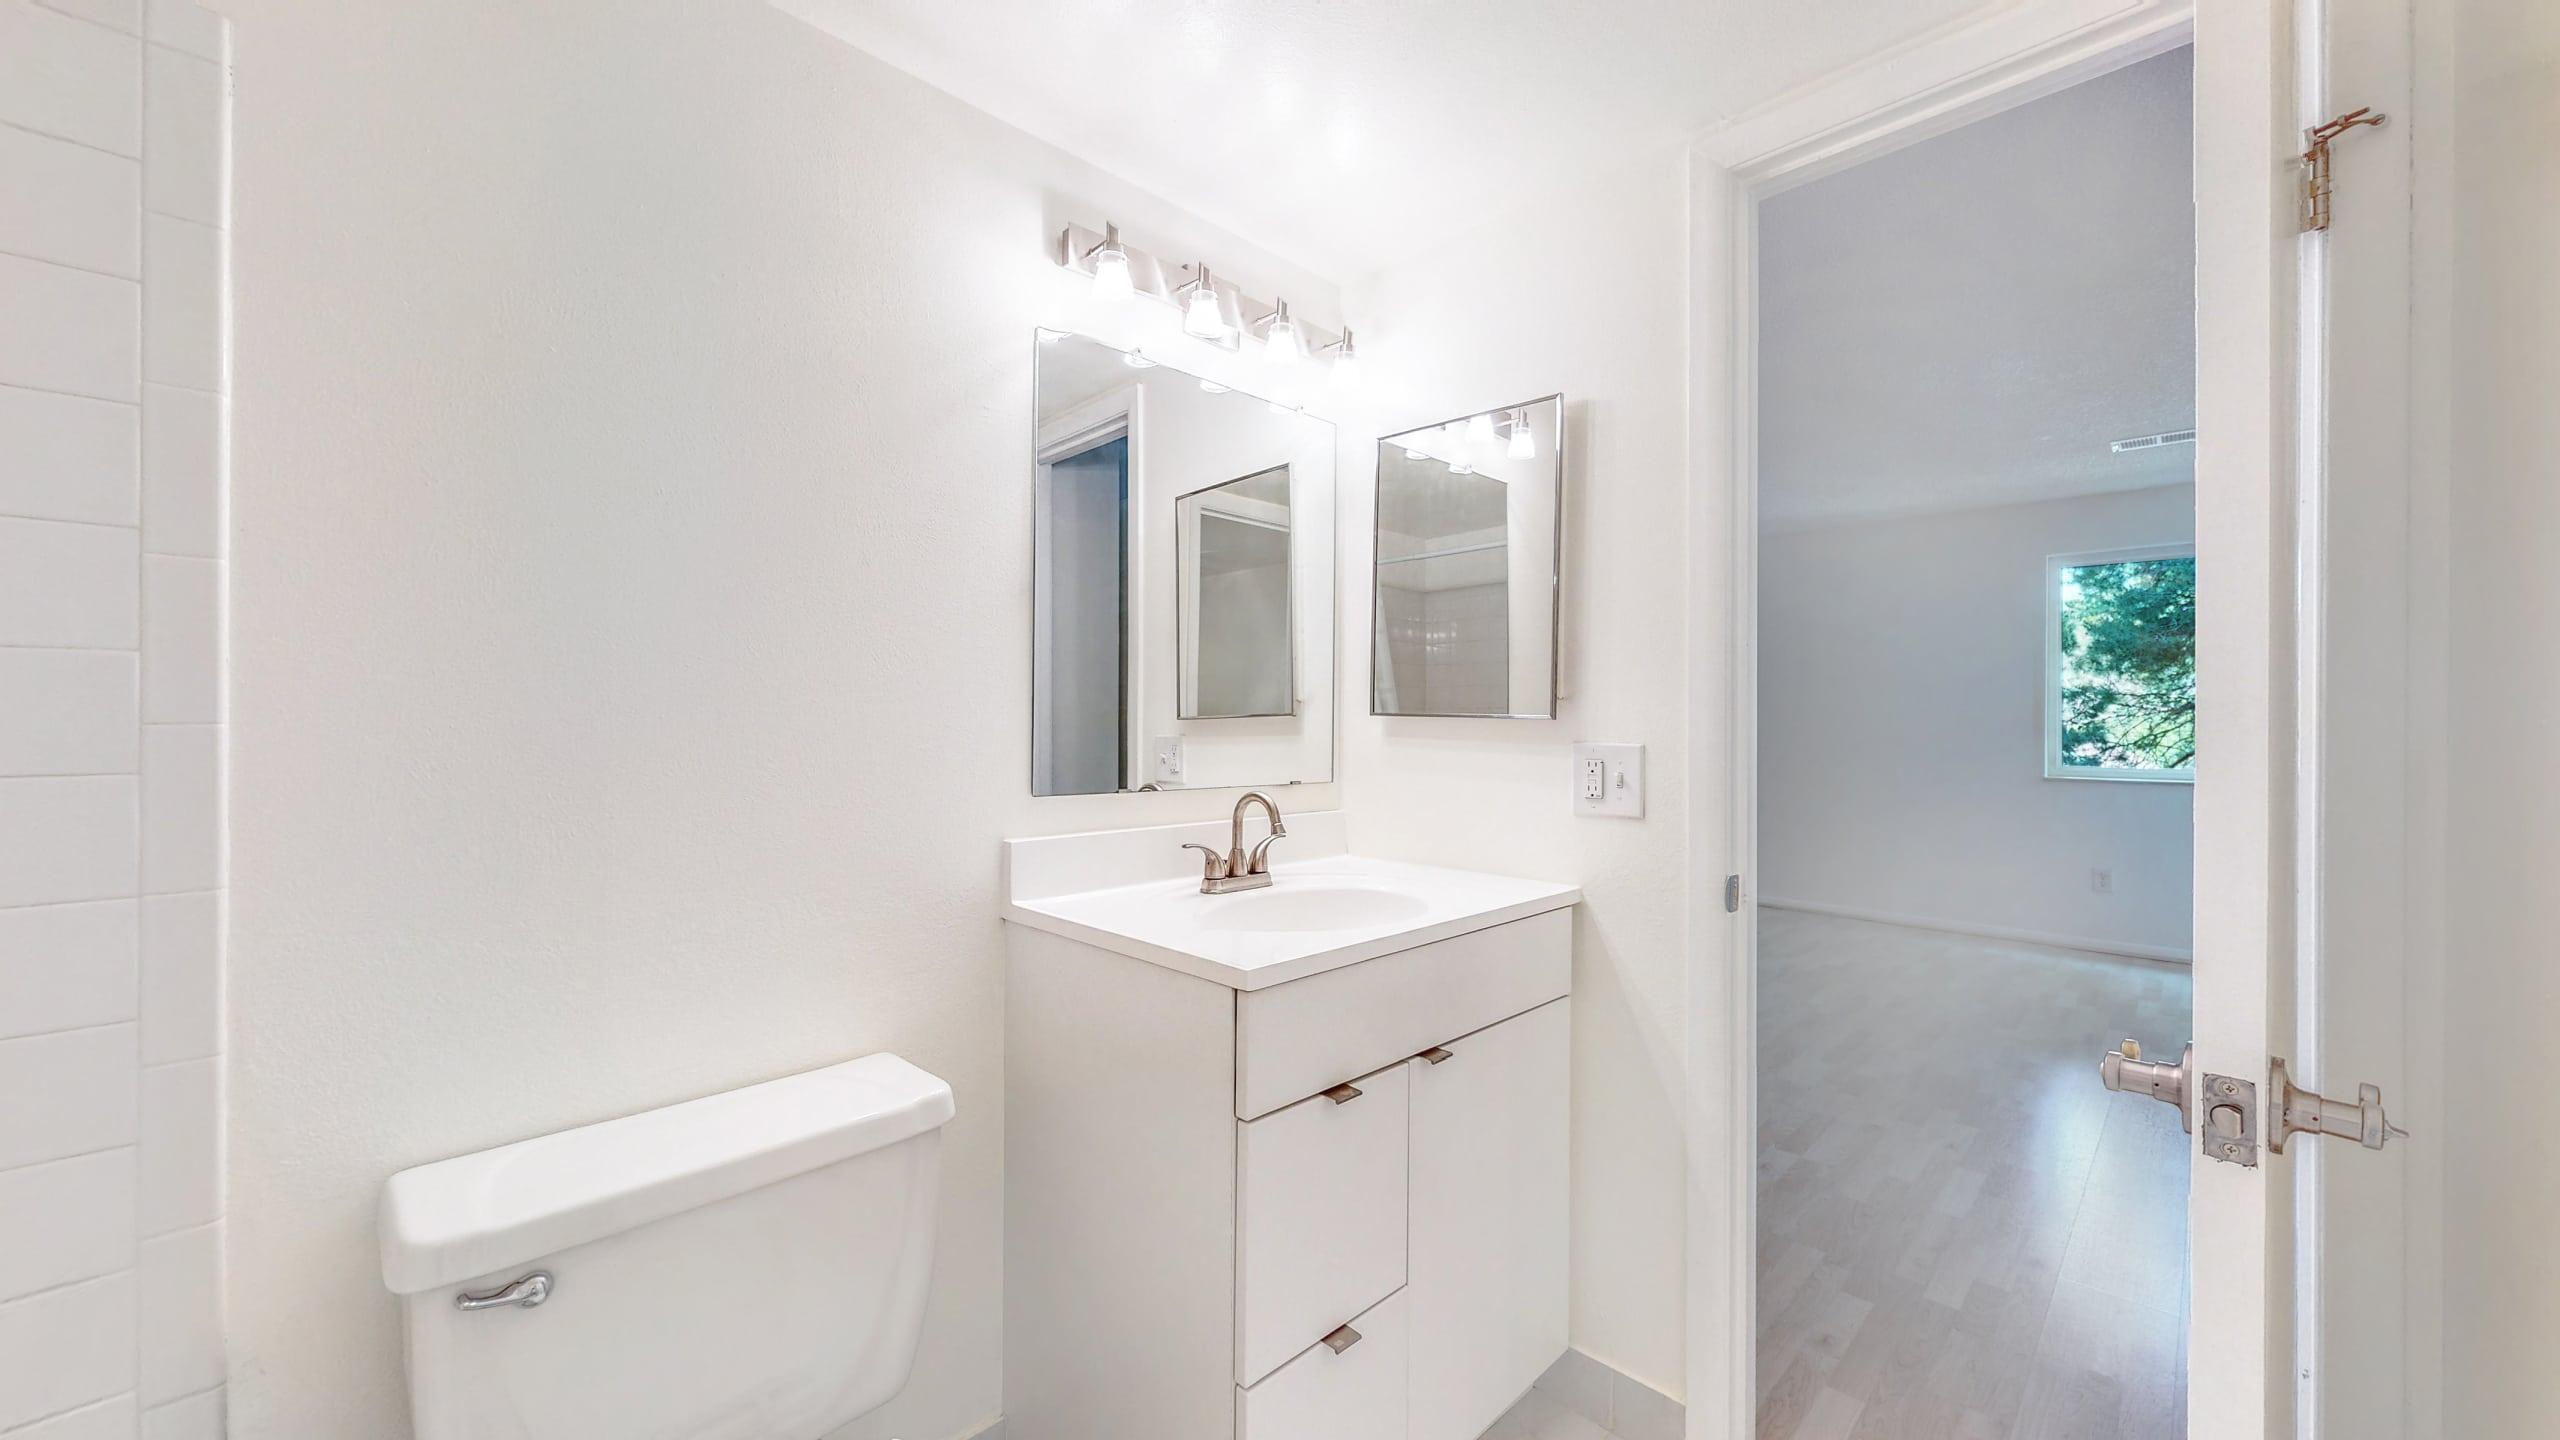 Clean Bathroom White Tile, white vanity